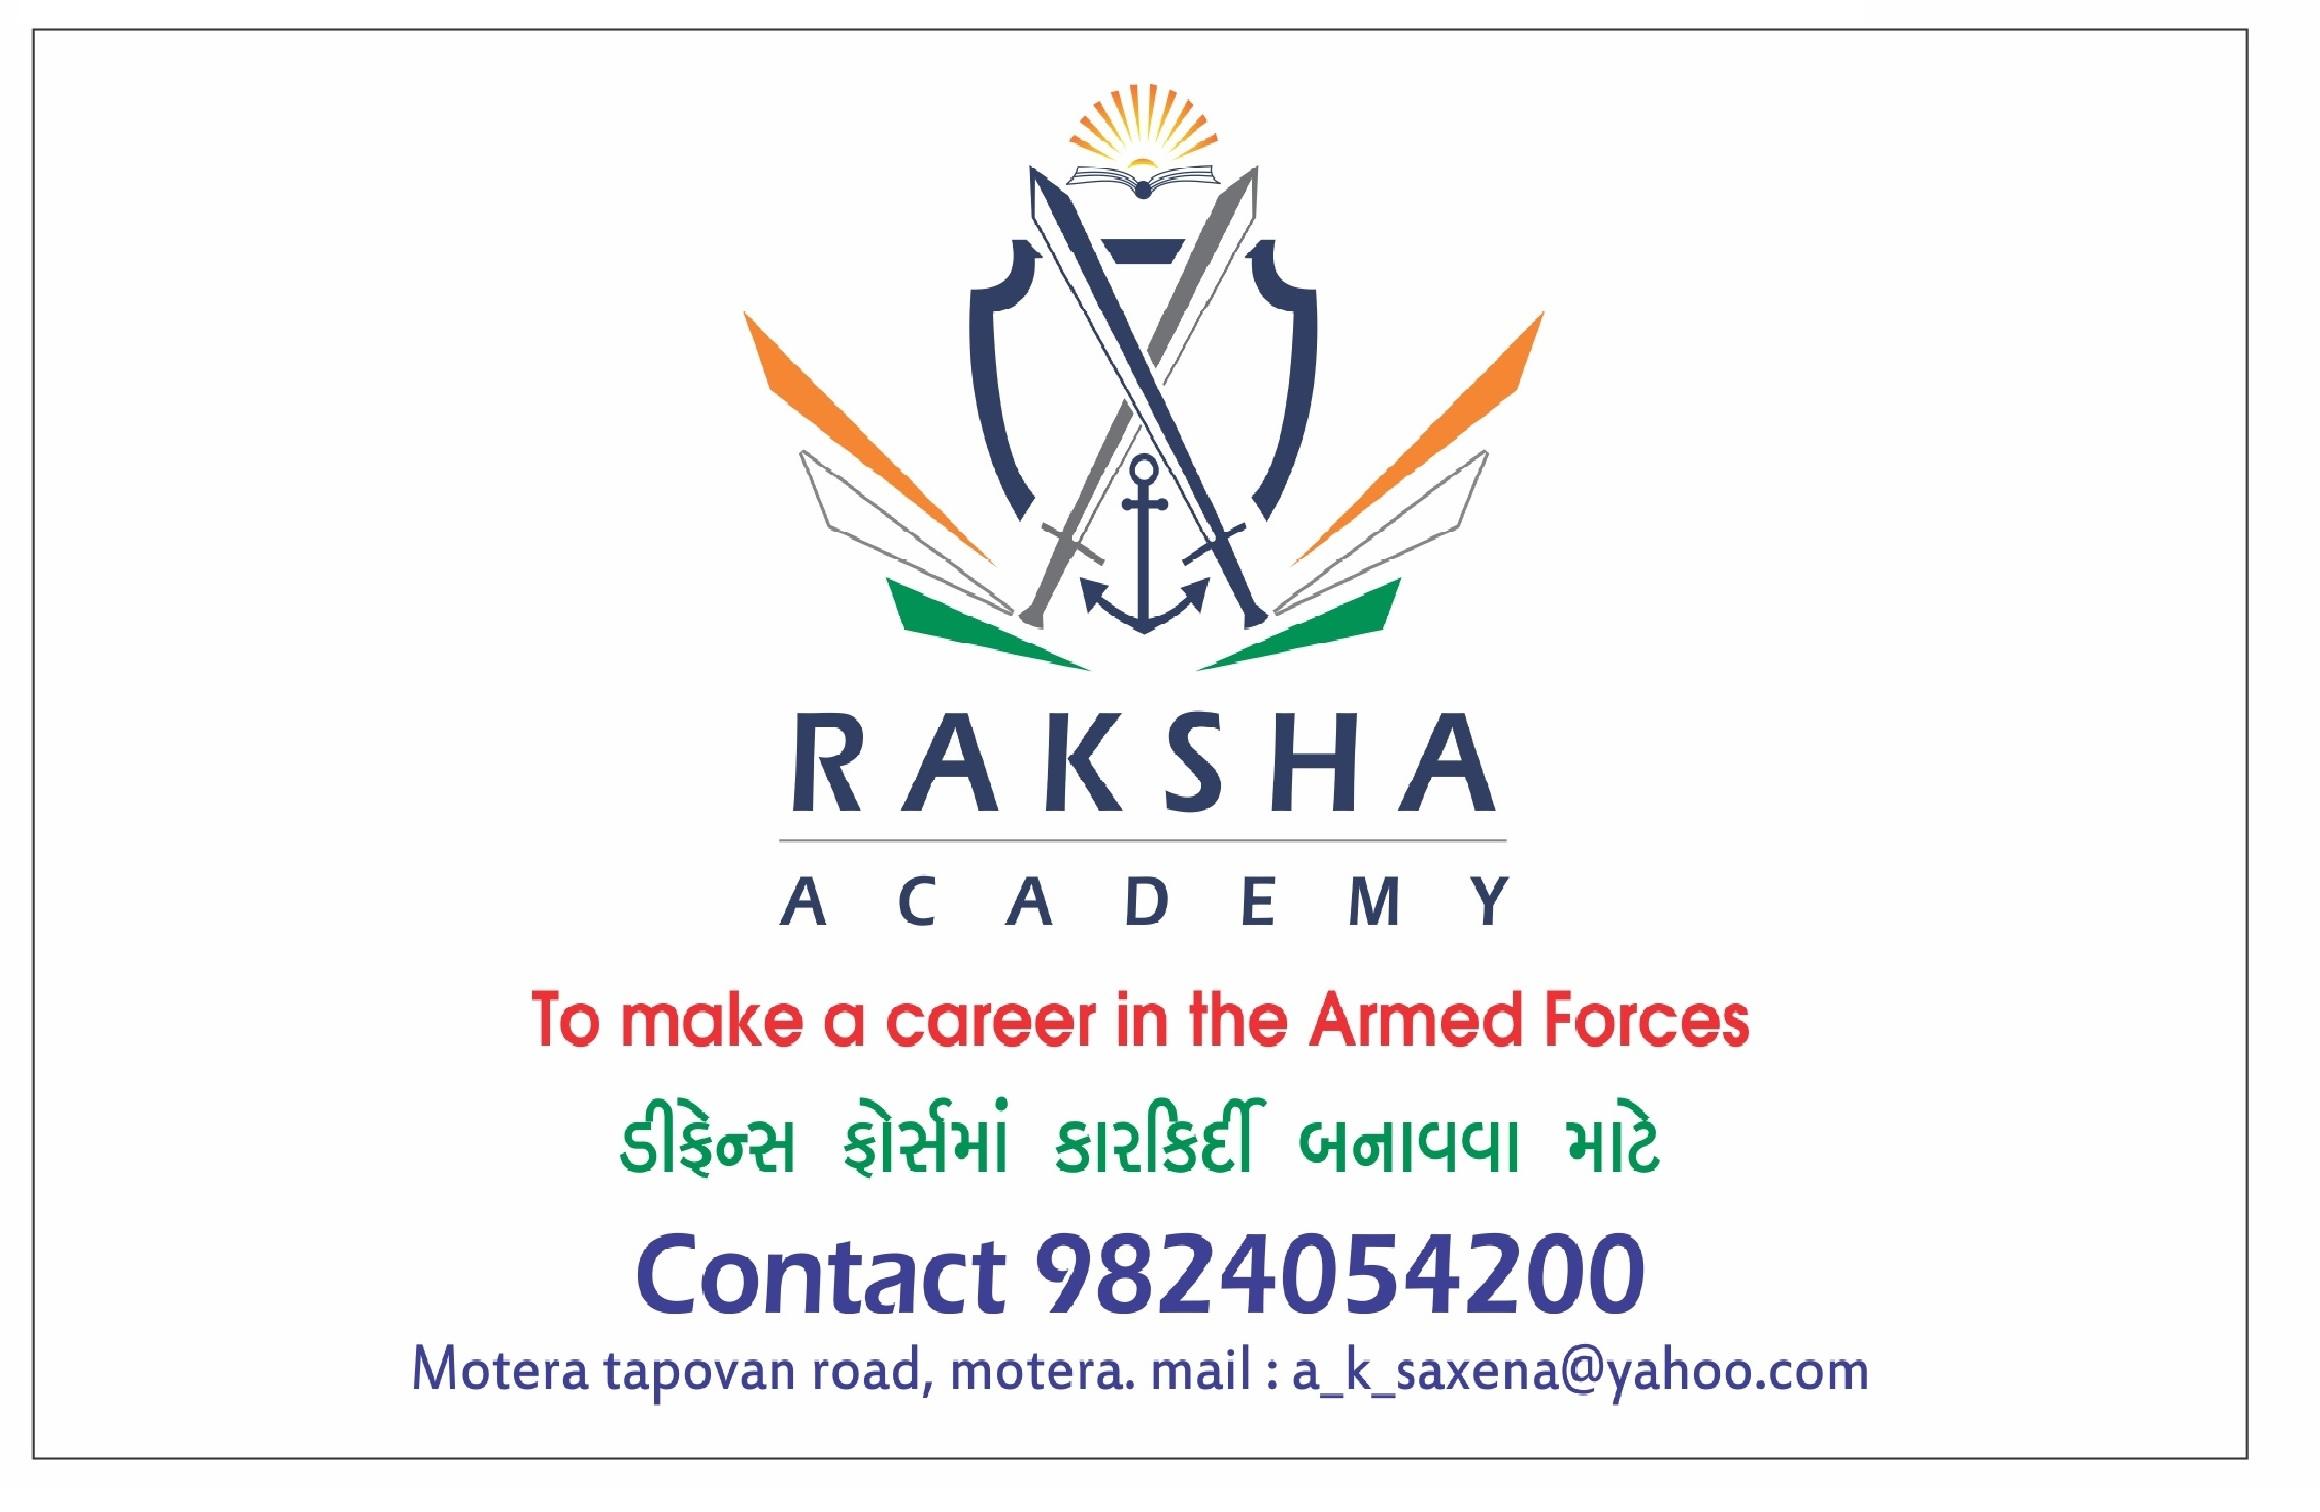 RAKSHAACADEMY in Motera, Ahmedabad-380005 | Sulekha Ahmedabad